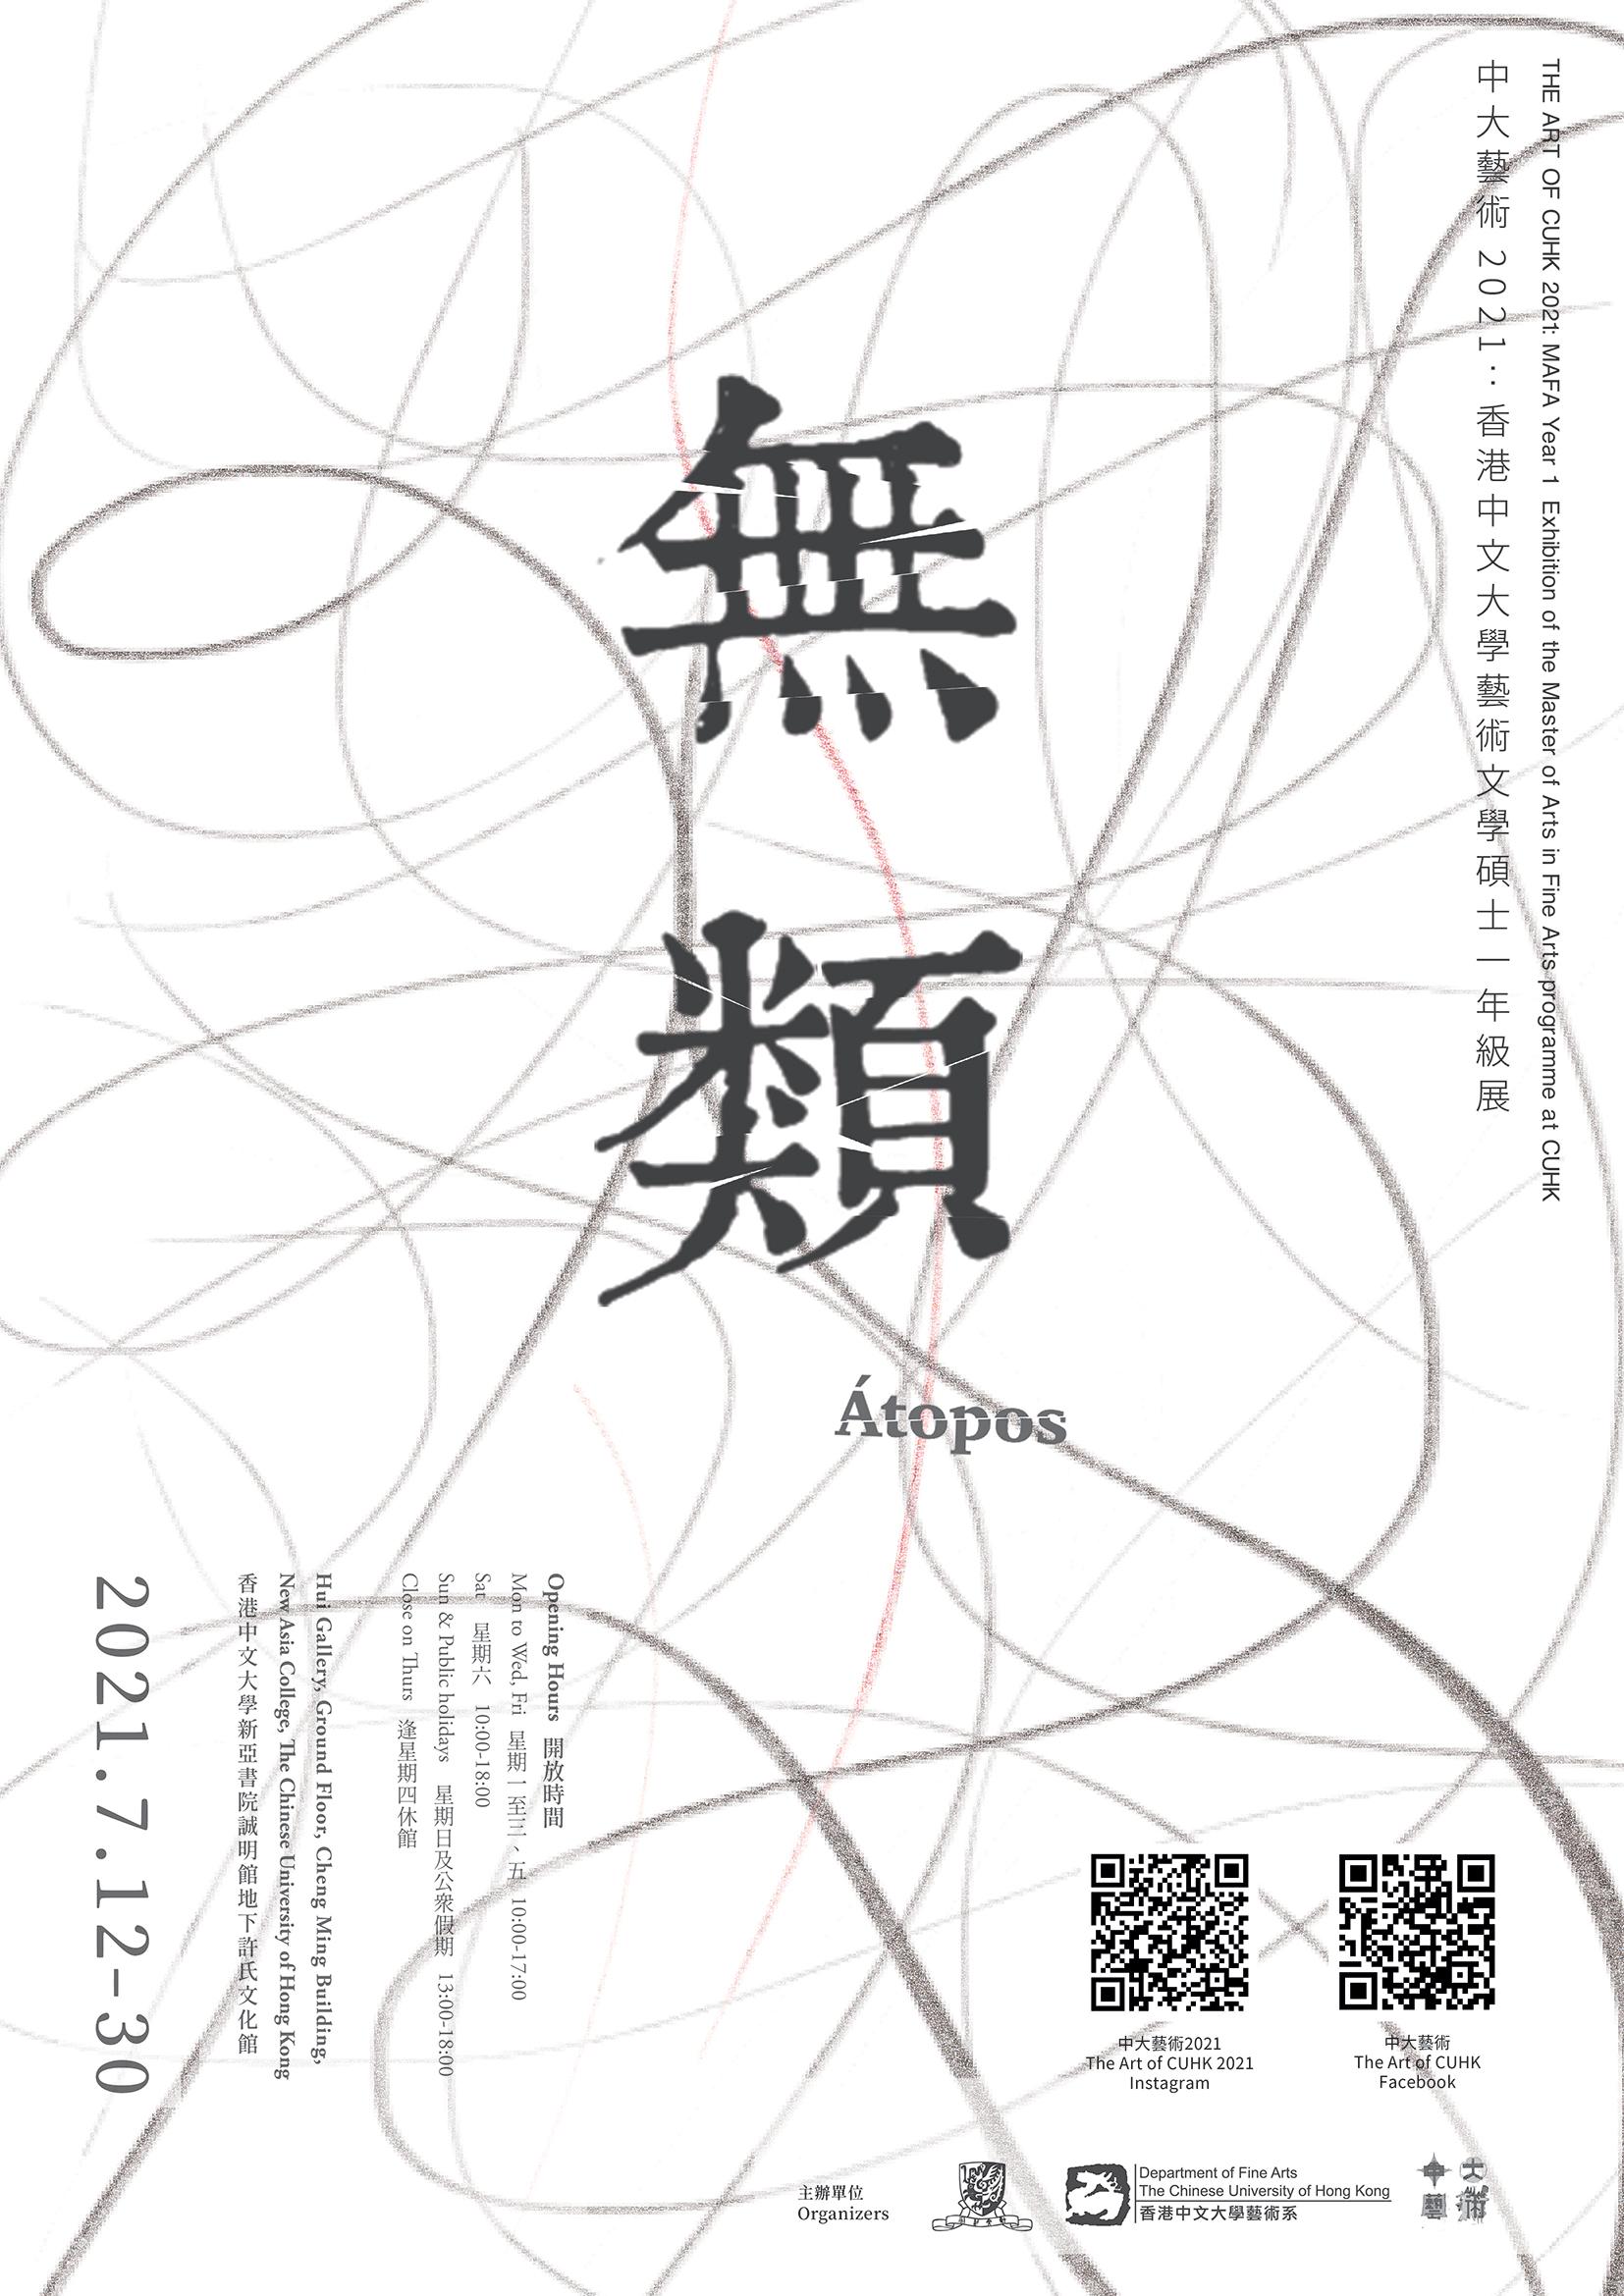 Master of Arts in Fine Arts Year One Exhibition -'Átopos'